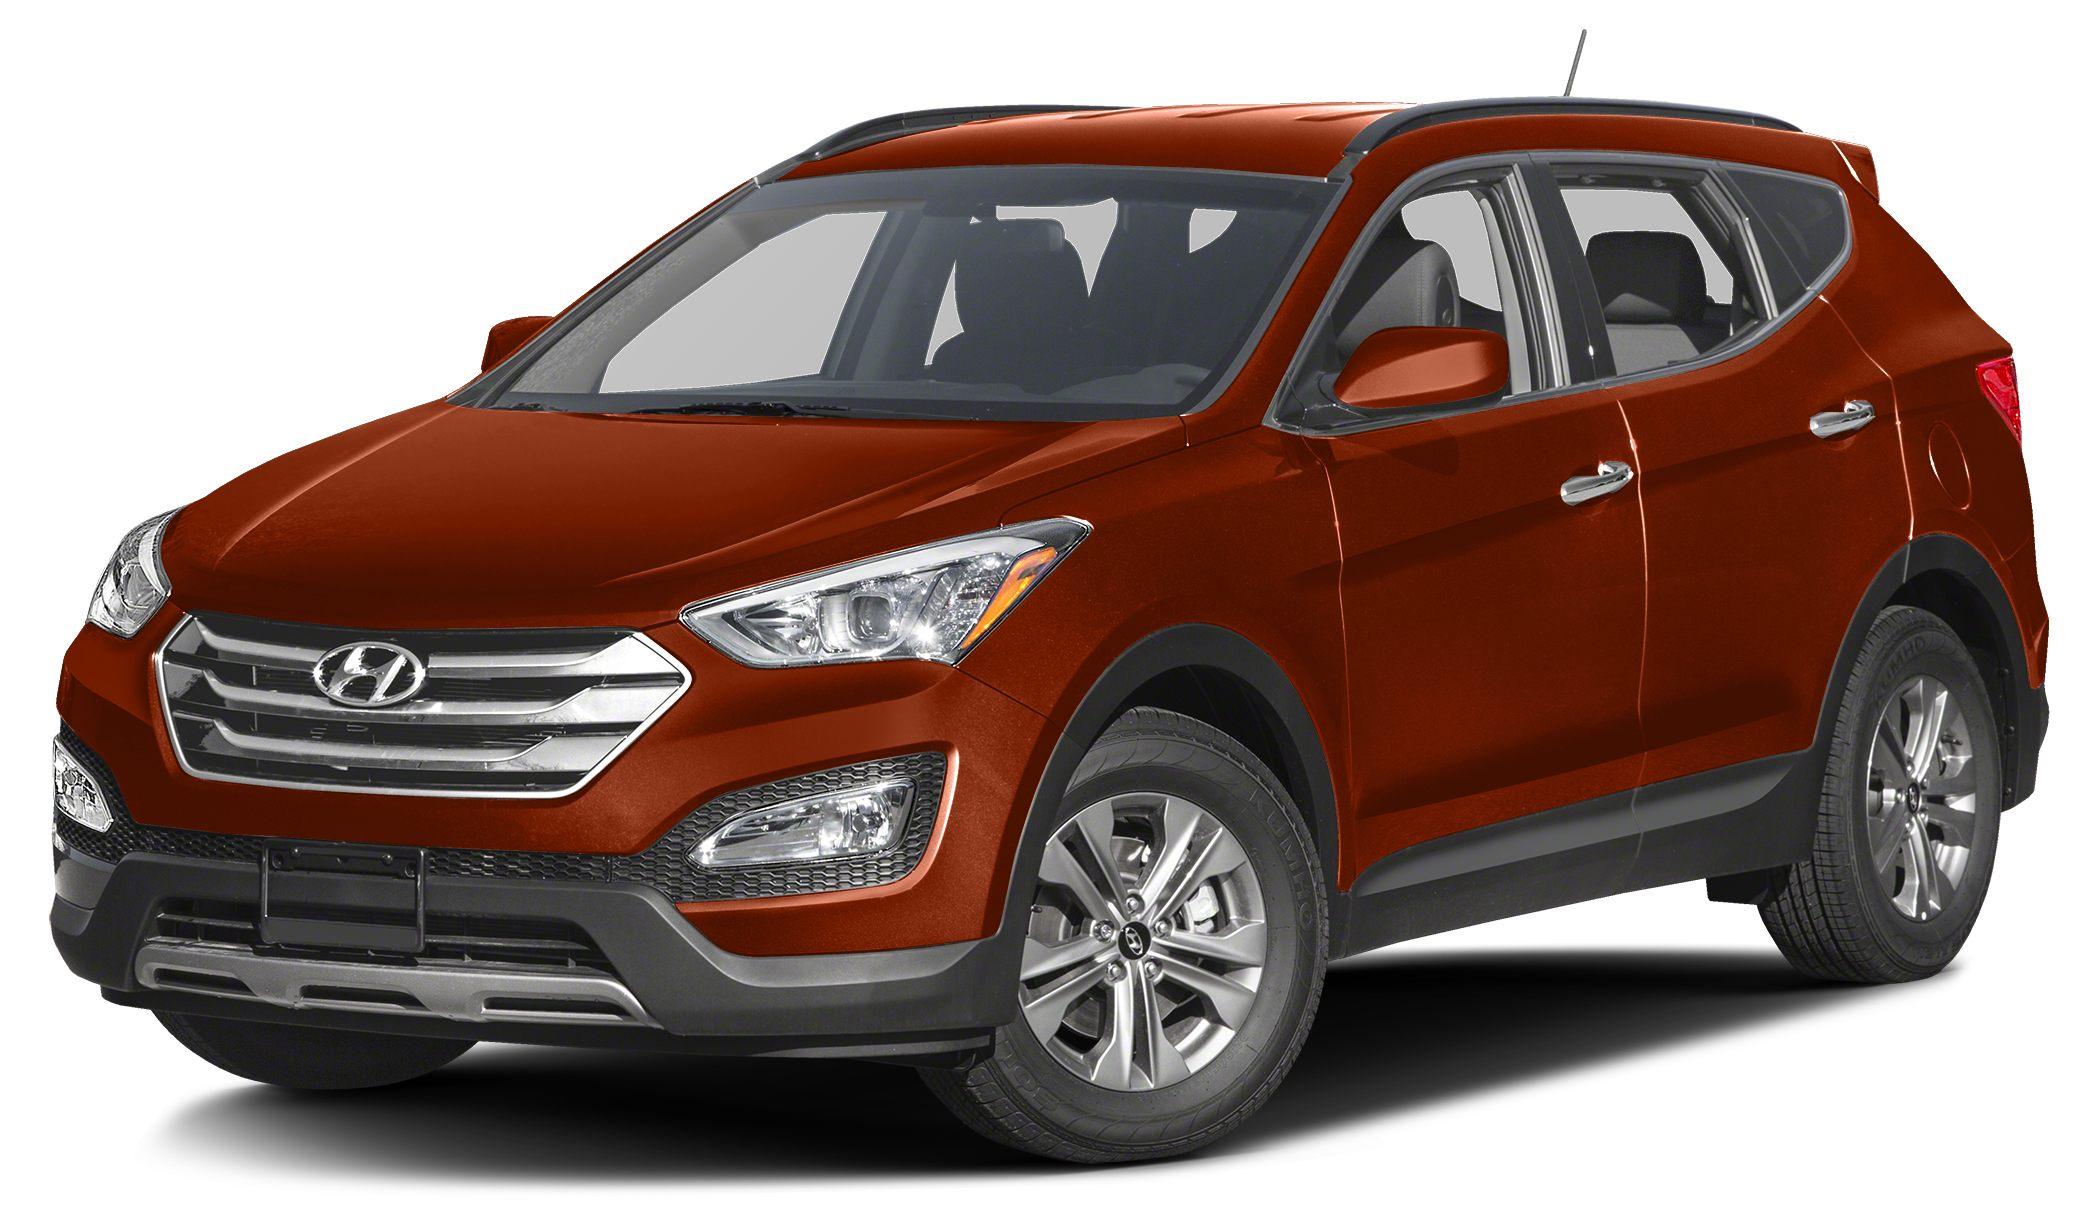 2016 Hyundai Santa Fe Sport 24 New Arrival This Santa Fe Sport Includes Satellite Radio AWD